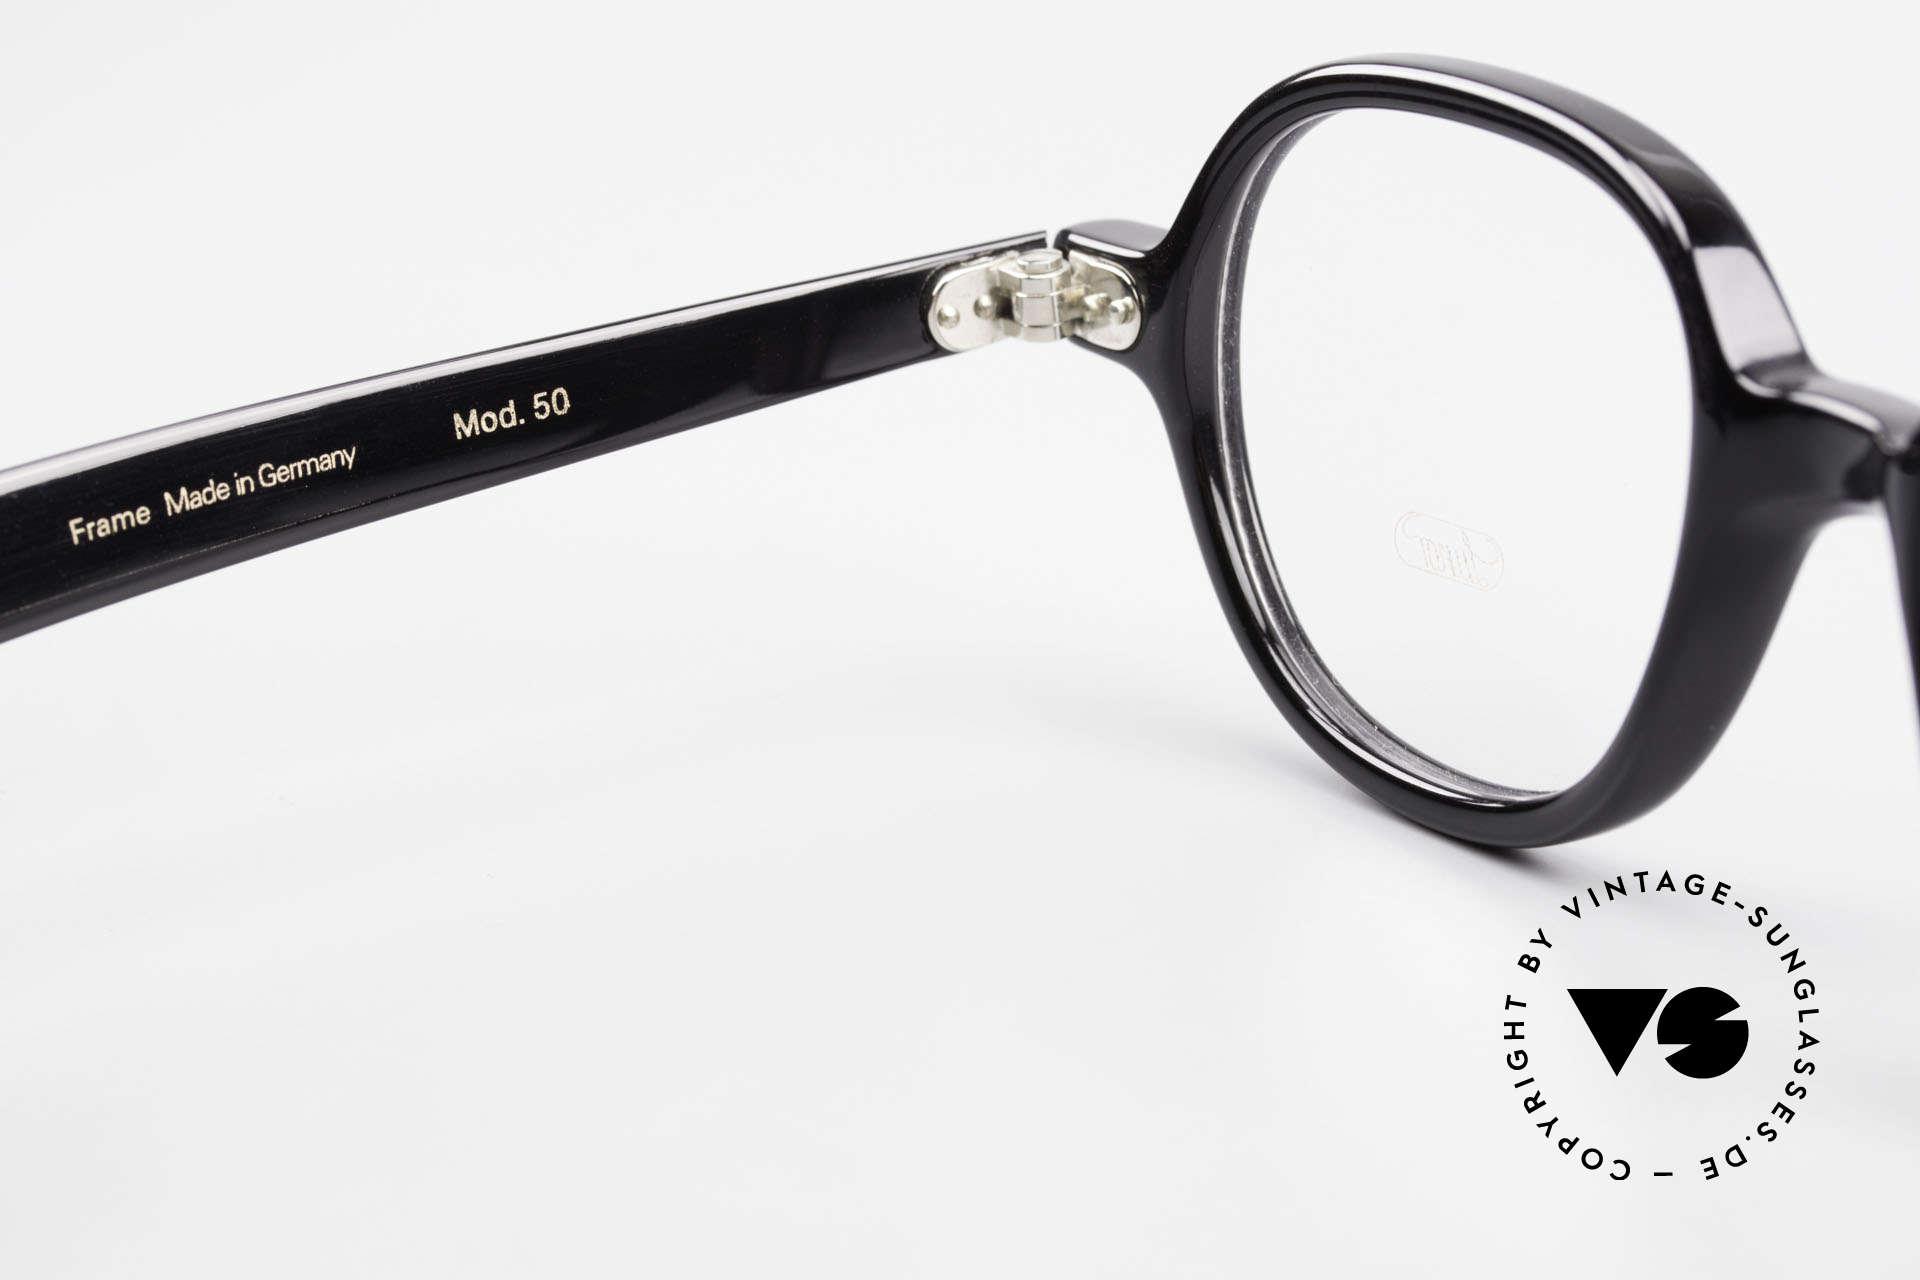 Lunor A50 Round Lunor Acetate Glasses, Size: medium, Made for Men and Women